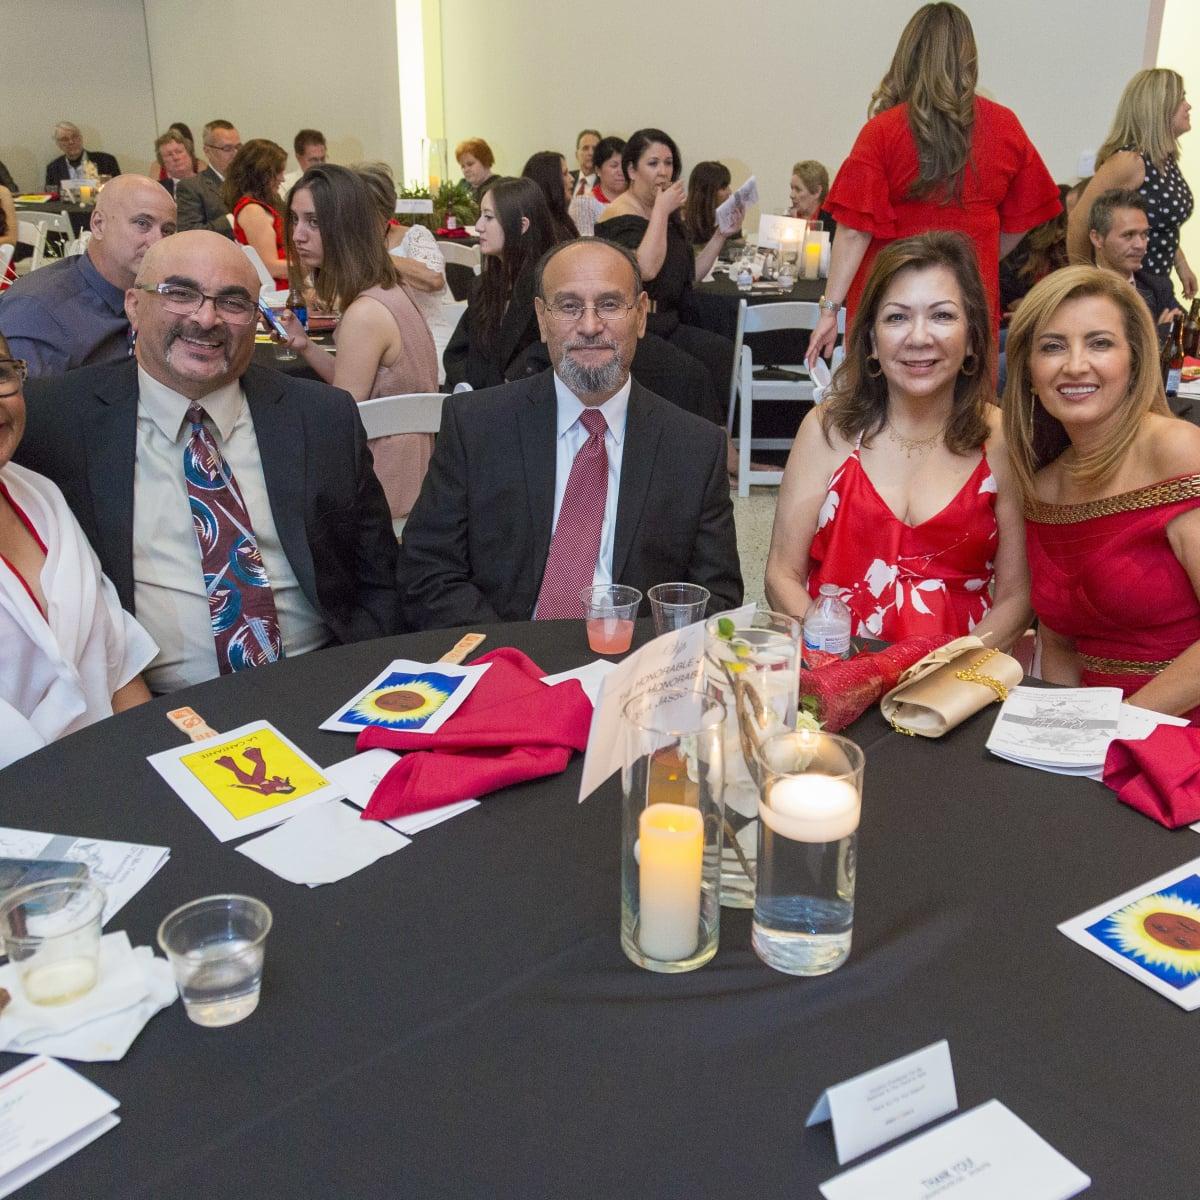 Sylvia Lagos, Al Lagos, The Honorable Judge Jasso, Delia Jasso, The Honorable Elba Garcia